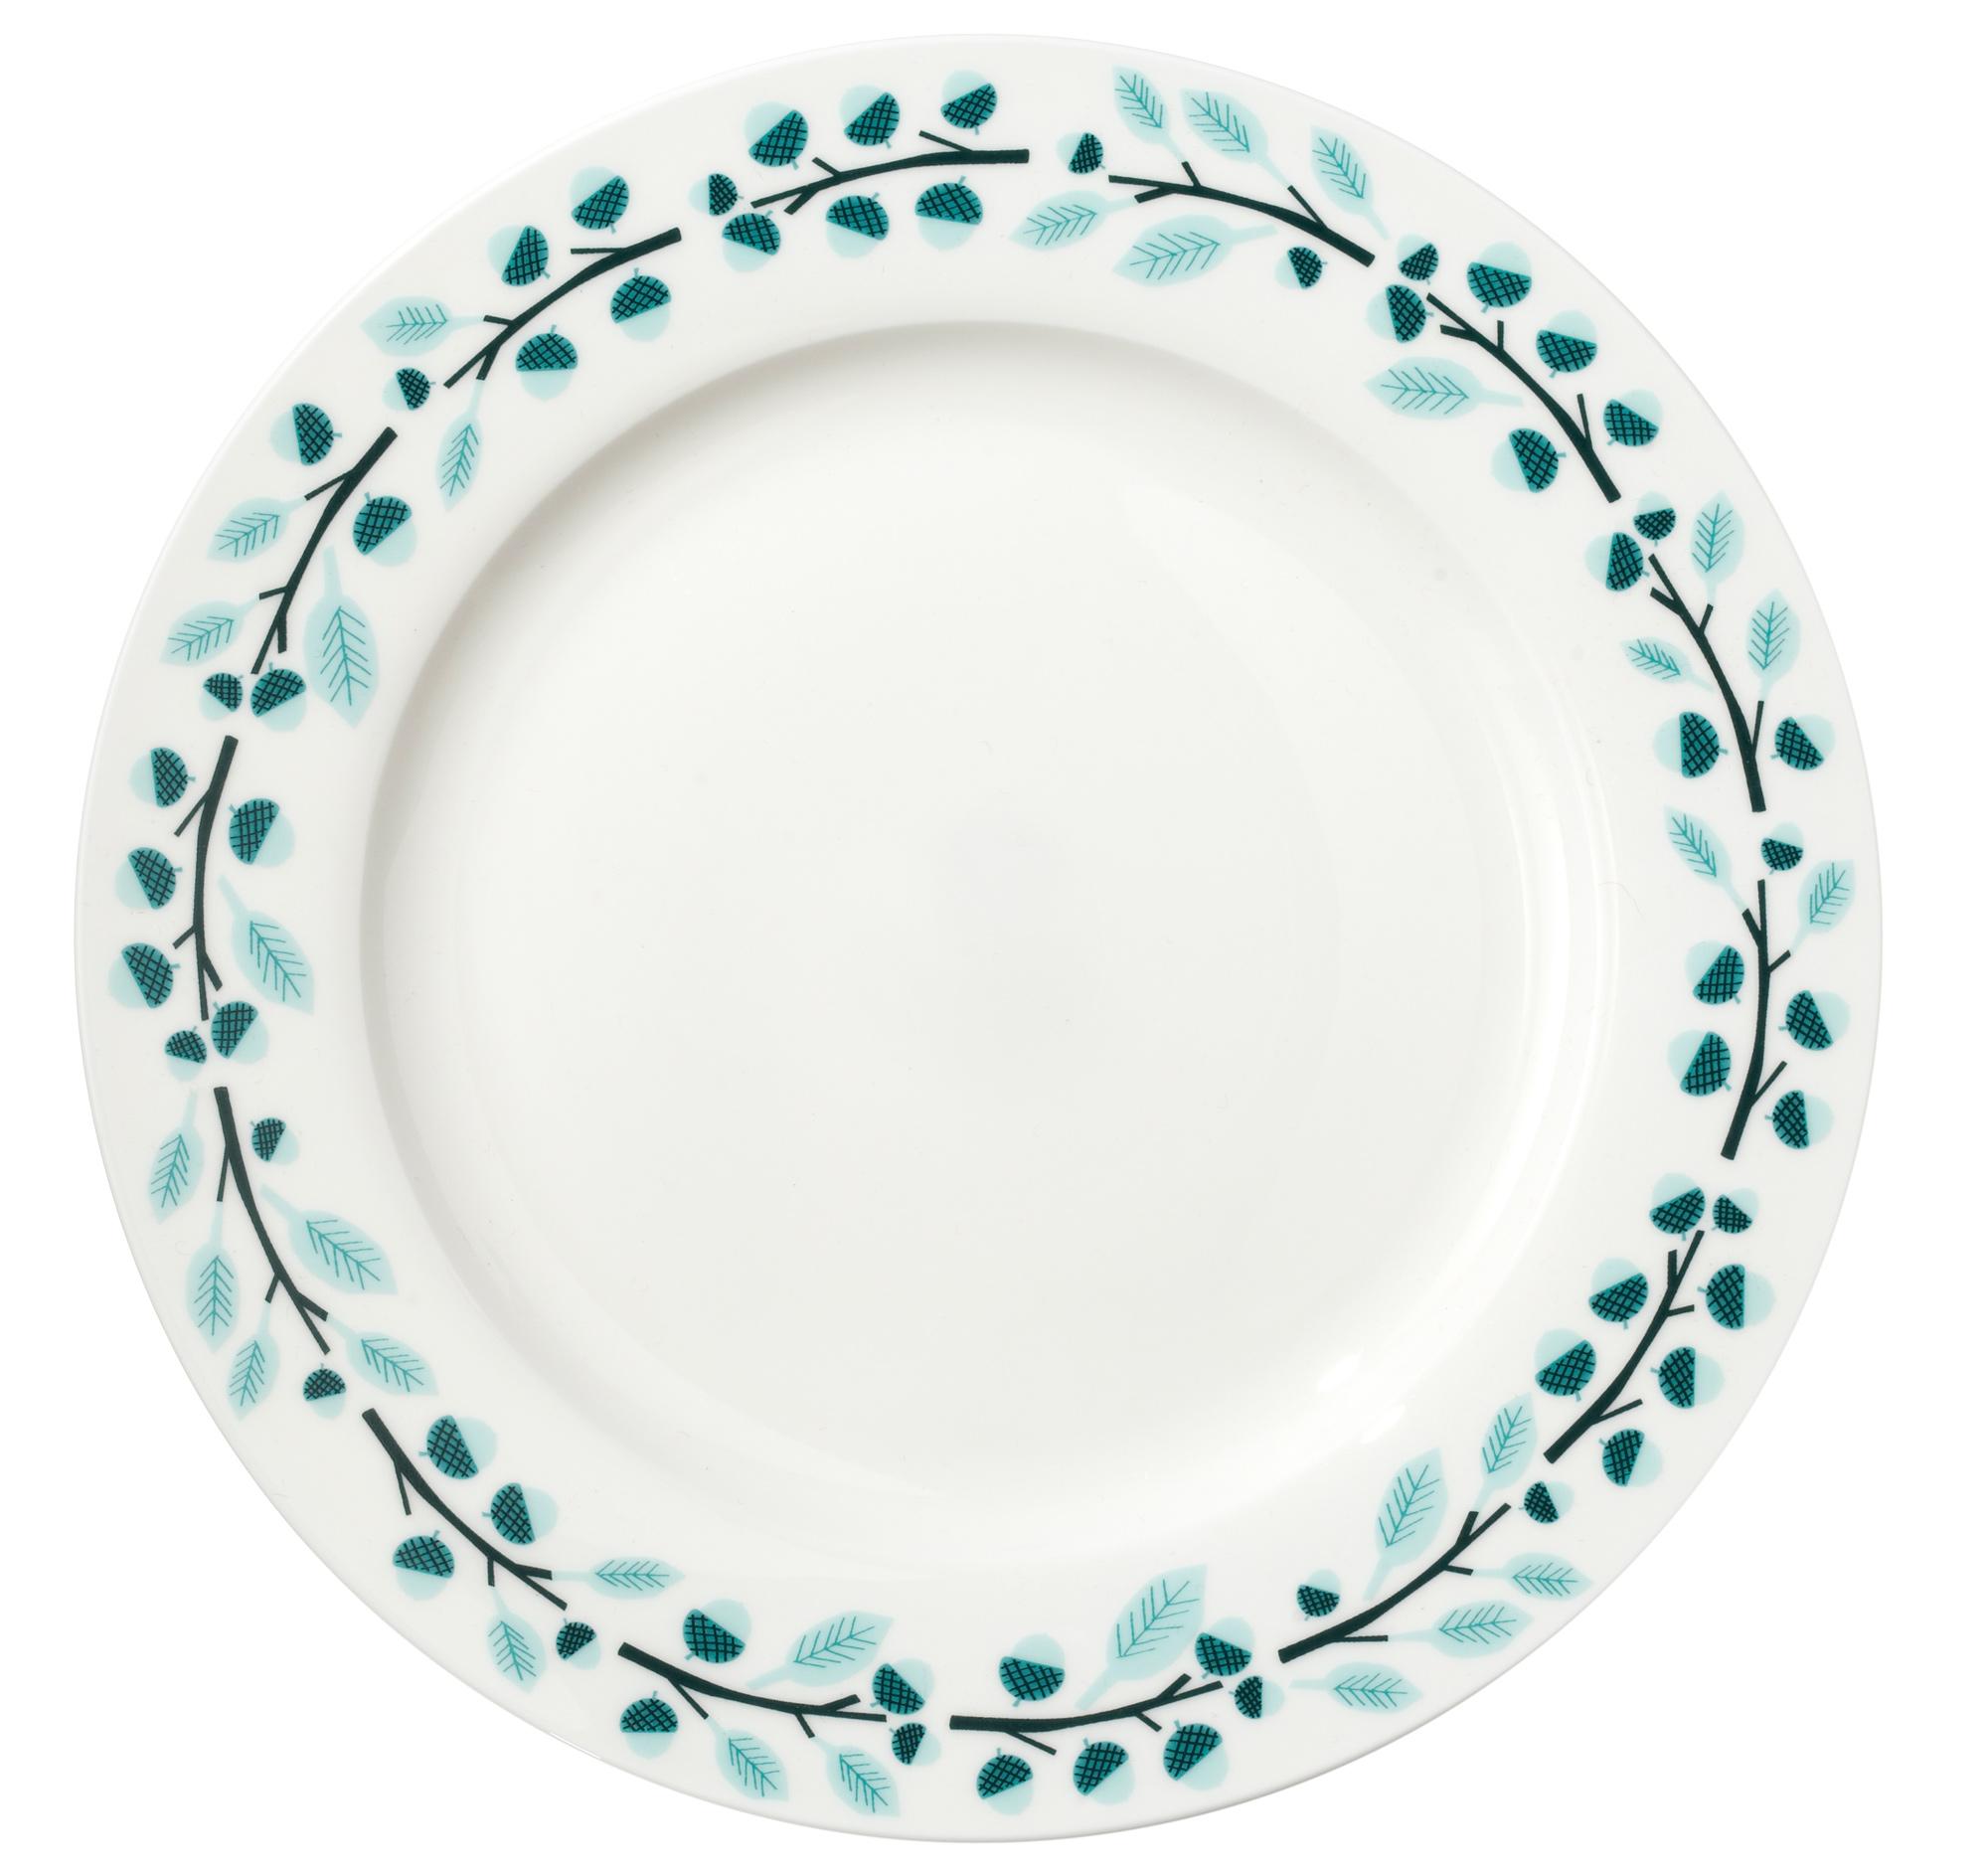 Acorn dinner plate donna wilson Beautiful plates